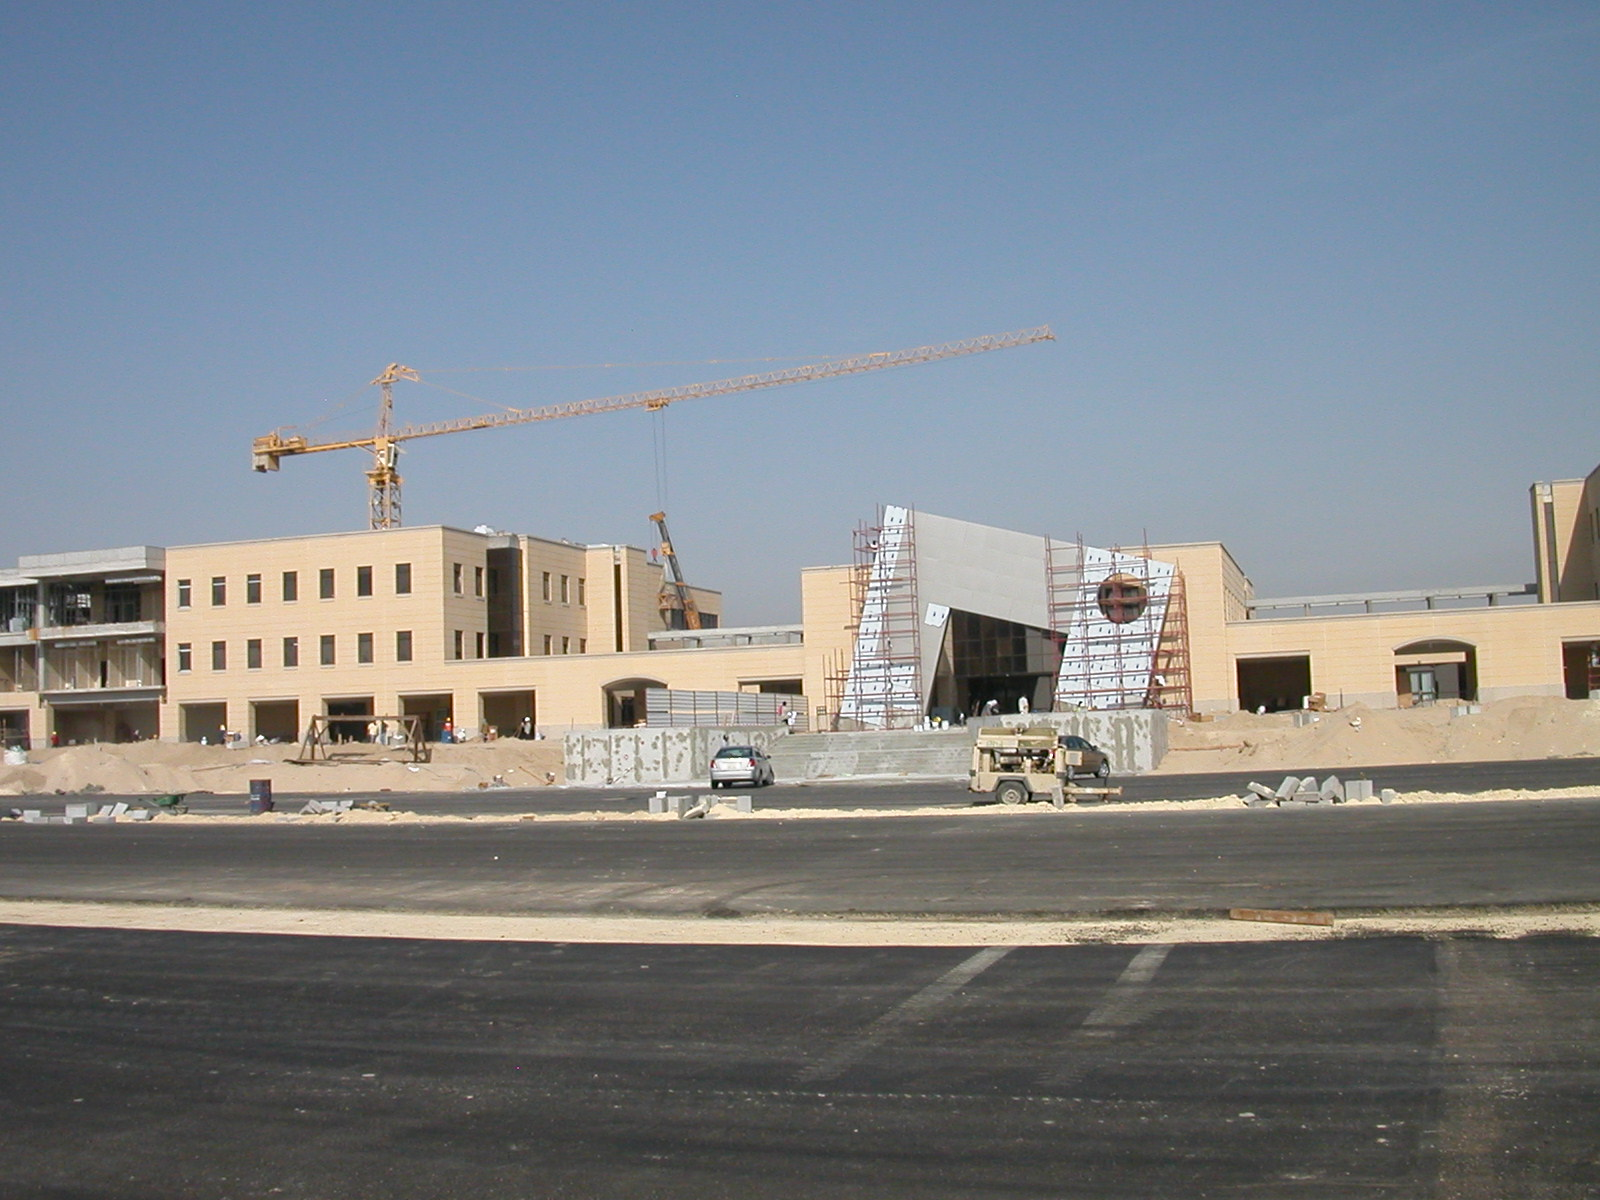 Photo of PMU campus under construction